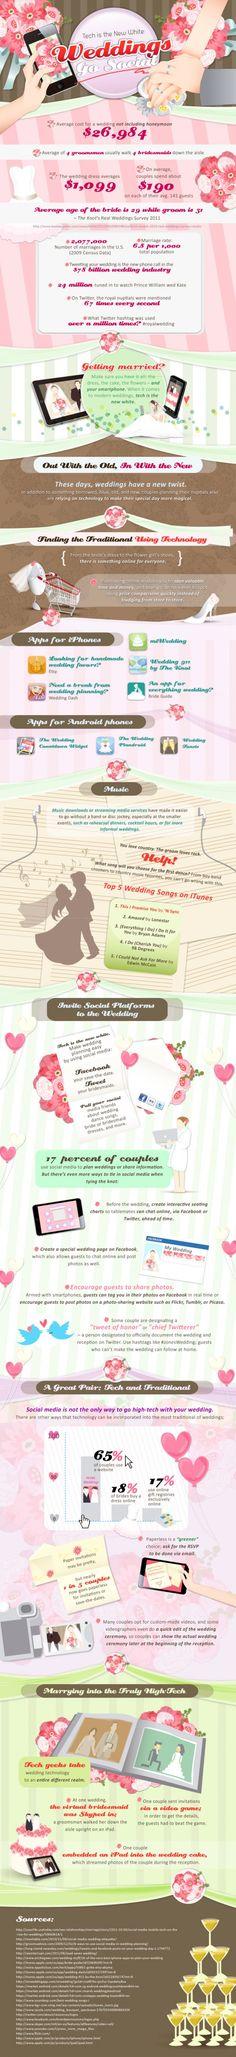 relationship, itunes, wedding planning, social media, brides, white weddings, marriage, blog, heavens